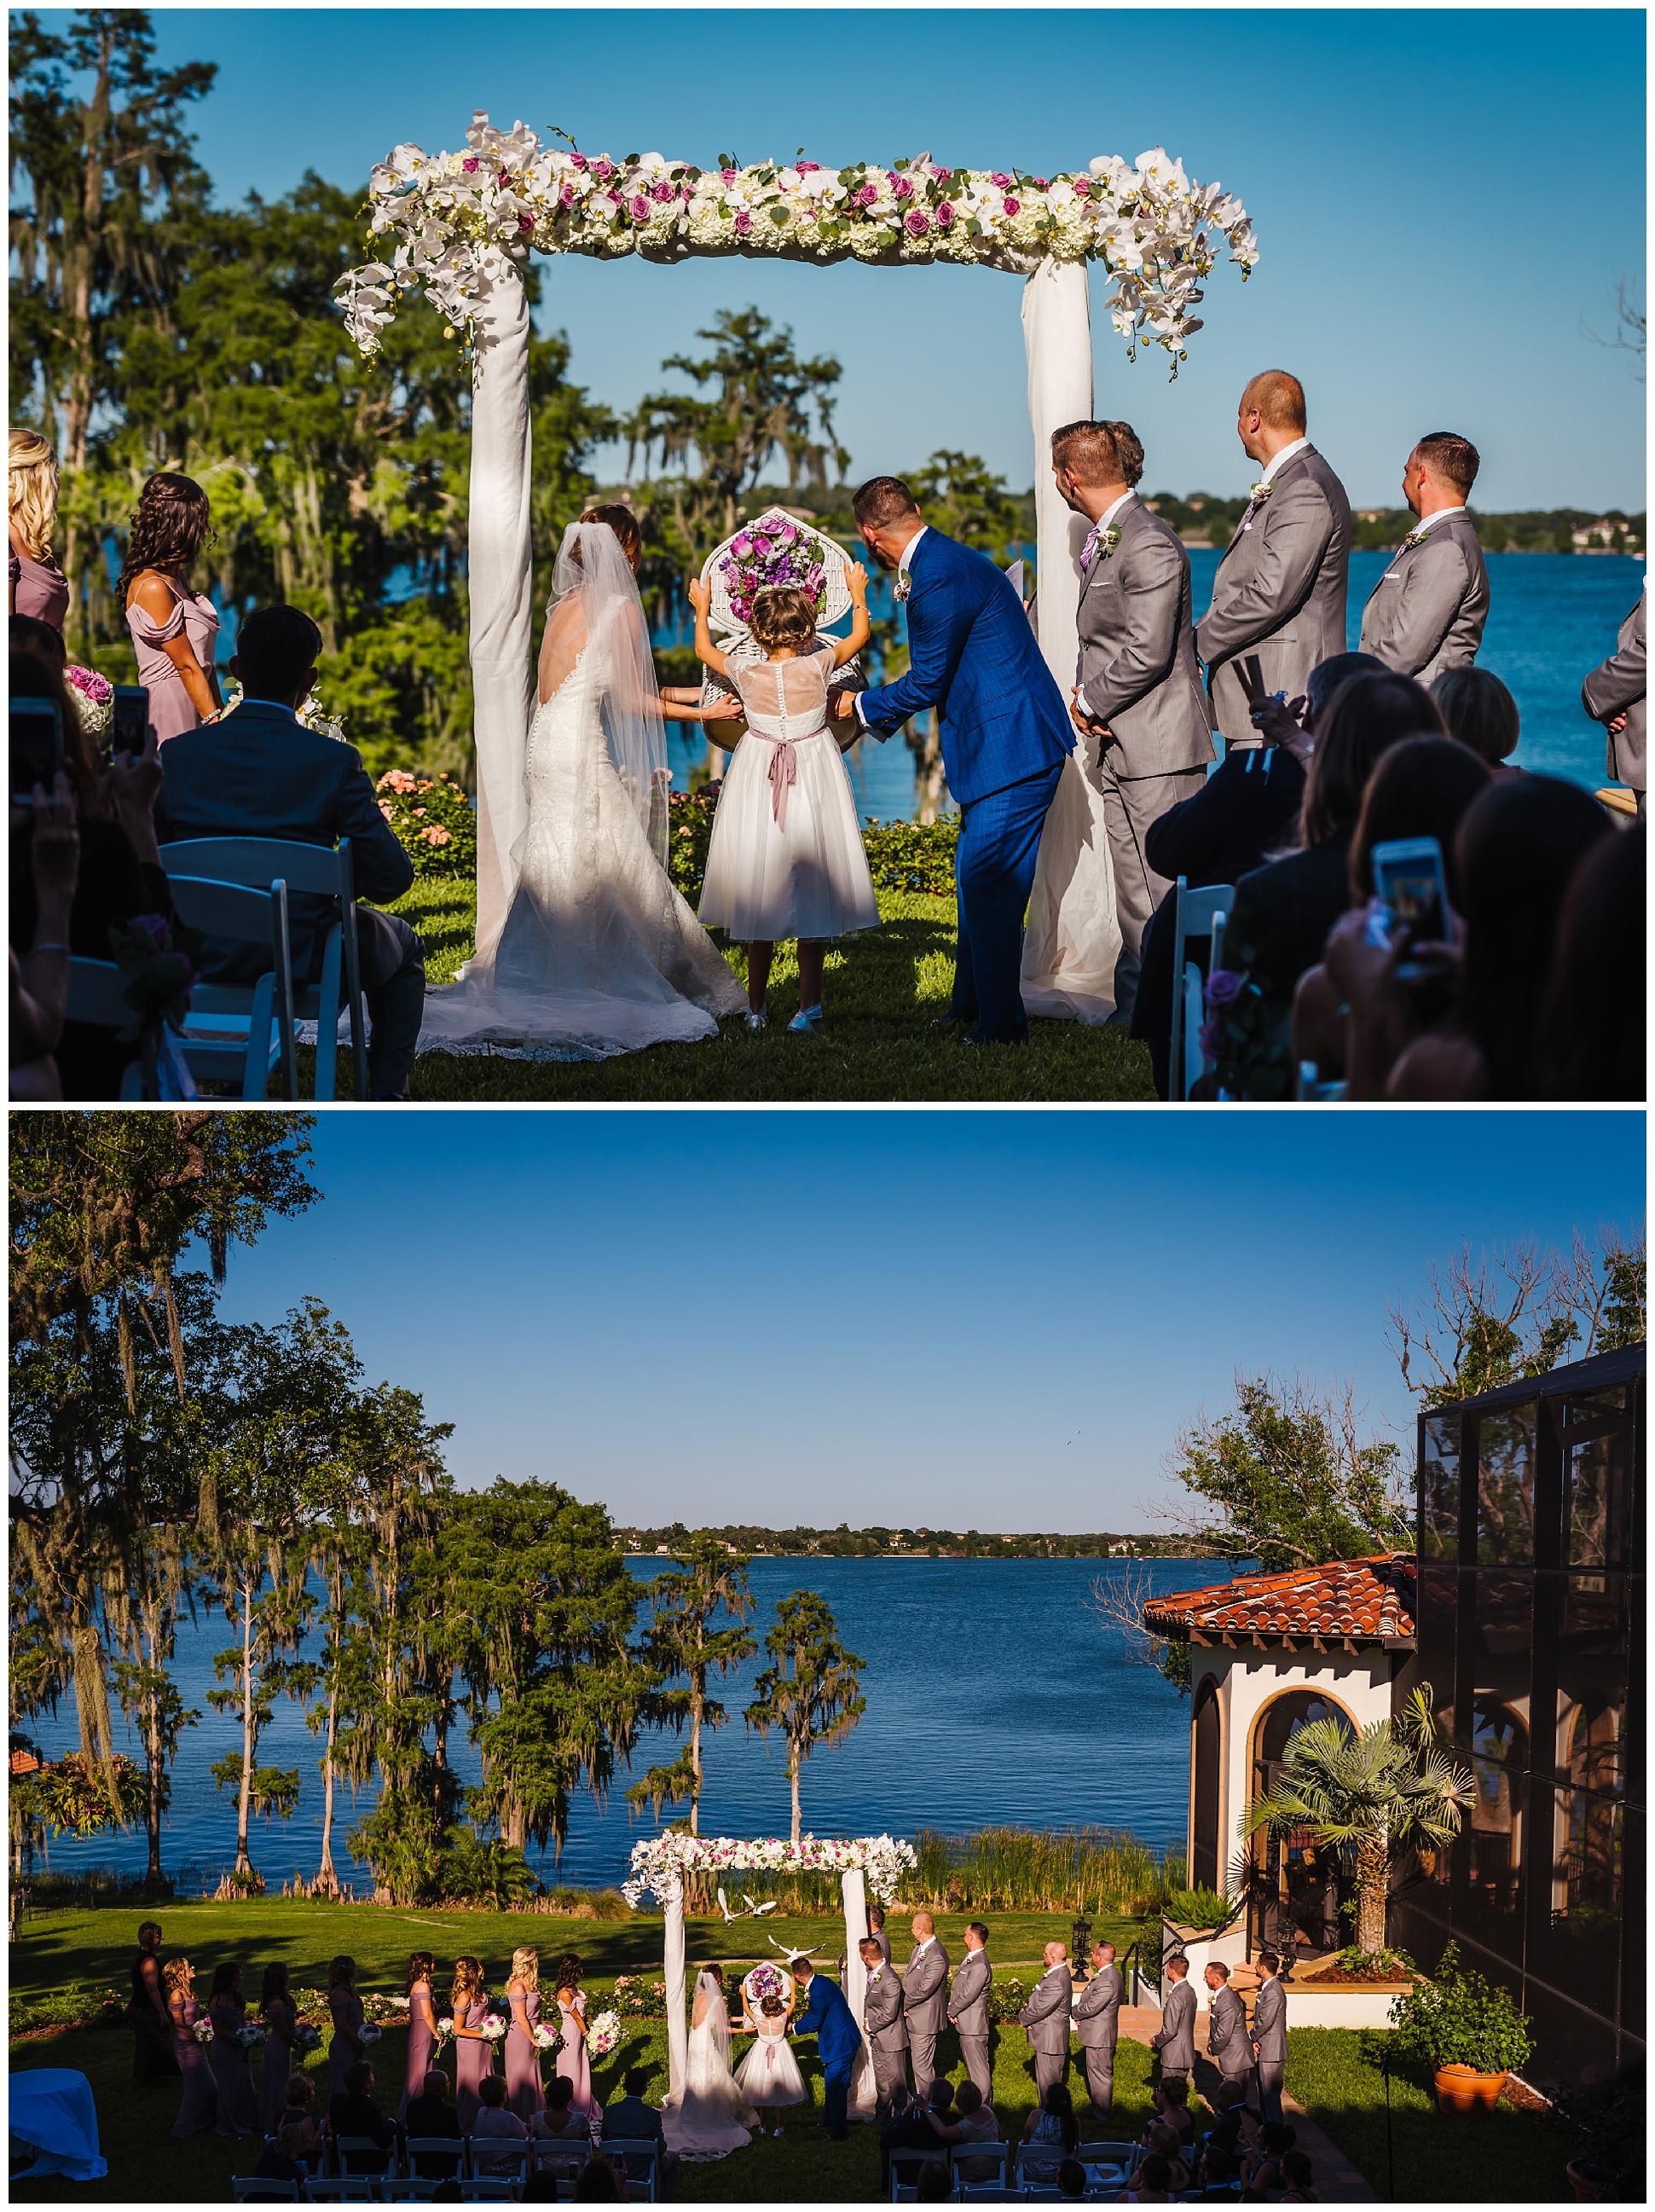 Tampa-luxury-wedding-photographer-mision-lago-private-estate_0030.jpg